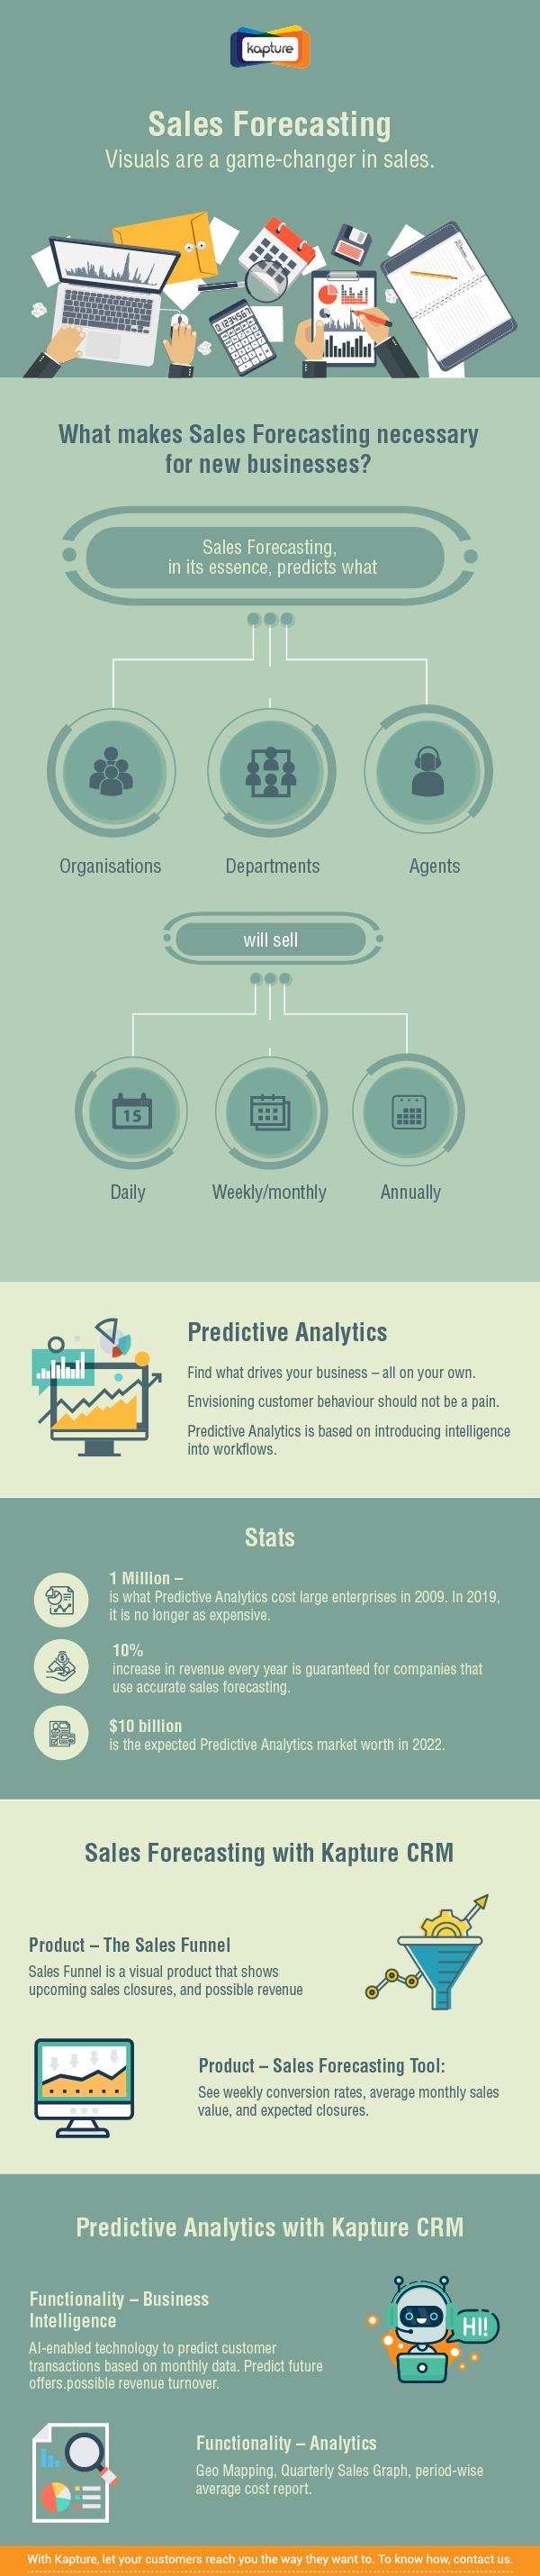 sales-forecasting-01